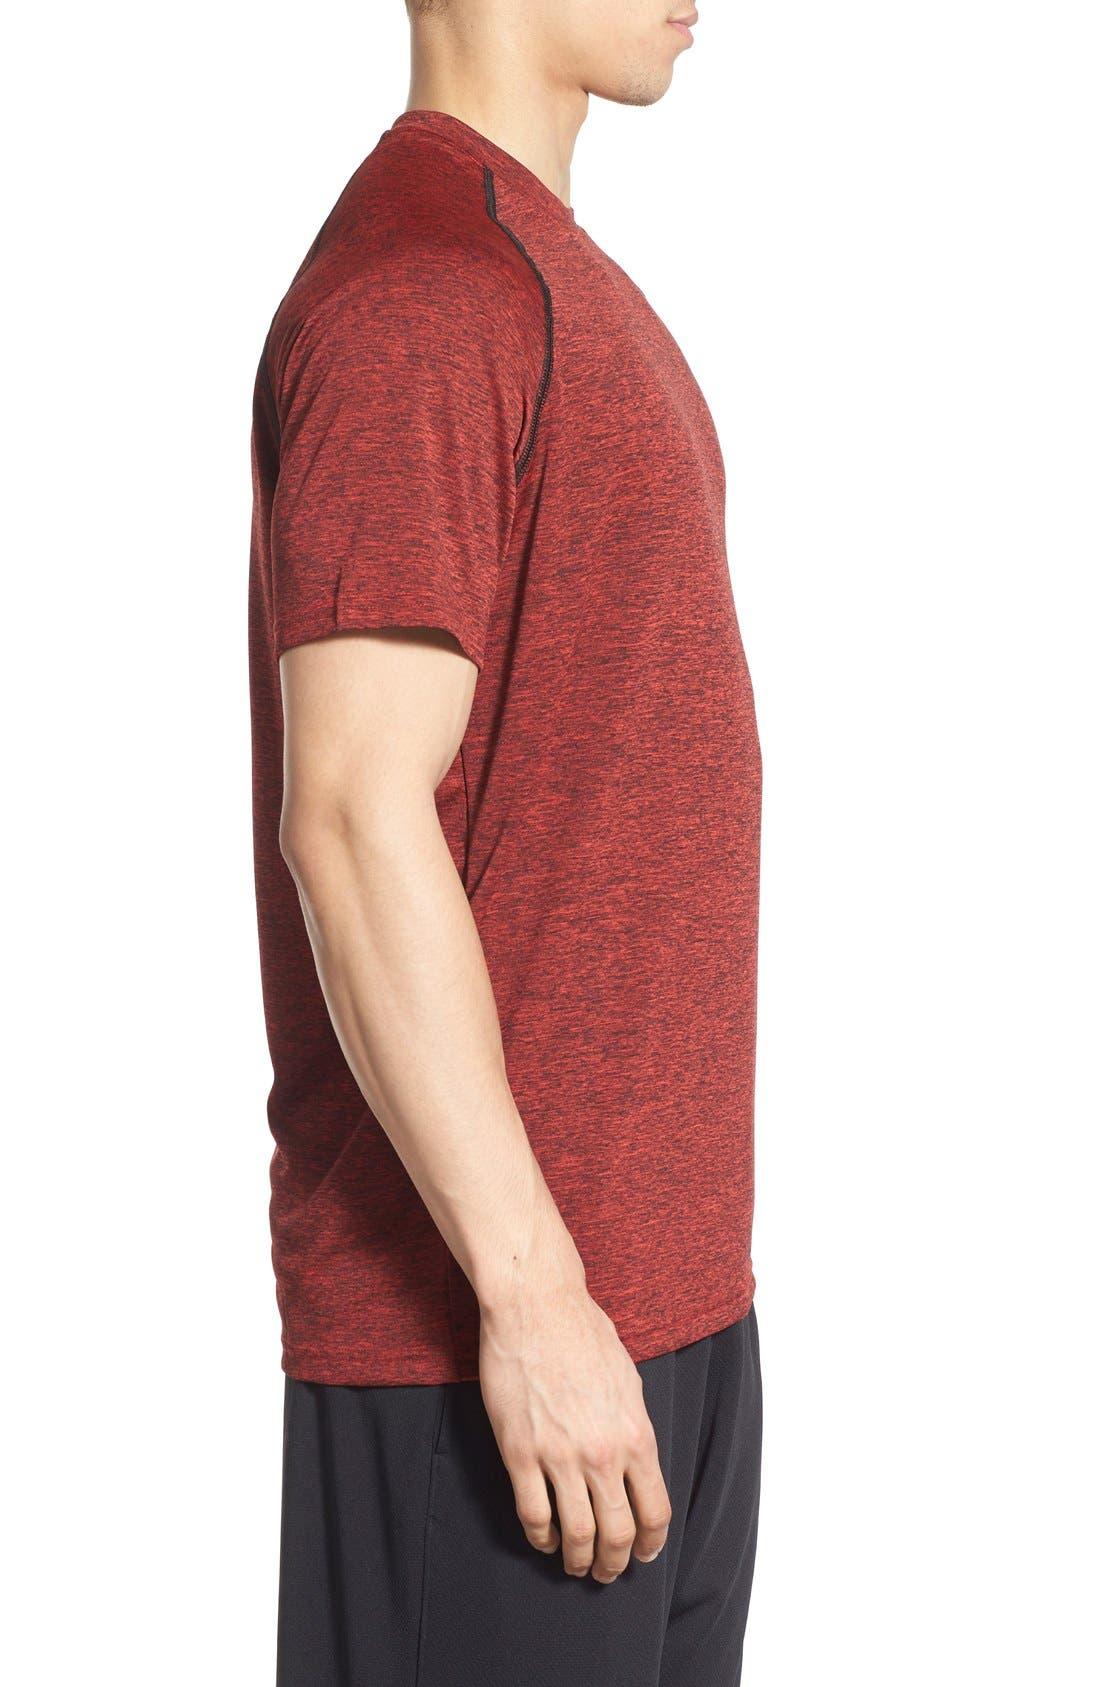 Alternate Image 3  - Under Armour 'UA Tech' Loose Fit Short Sleeve T-Shirt